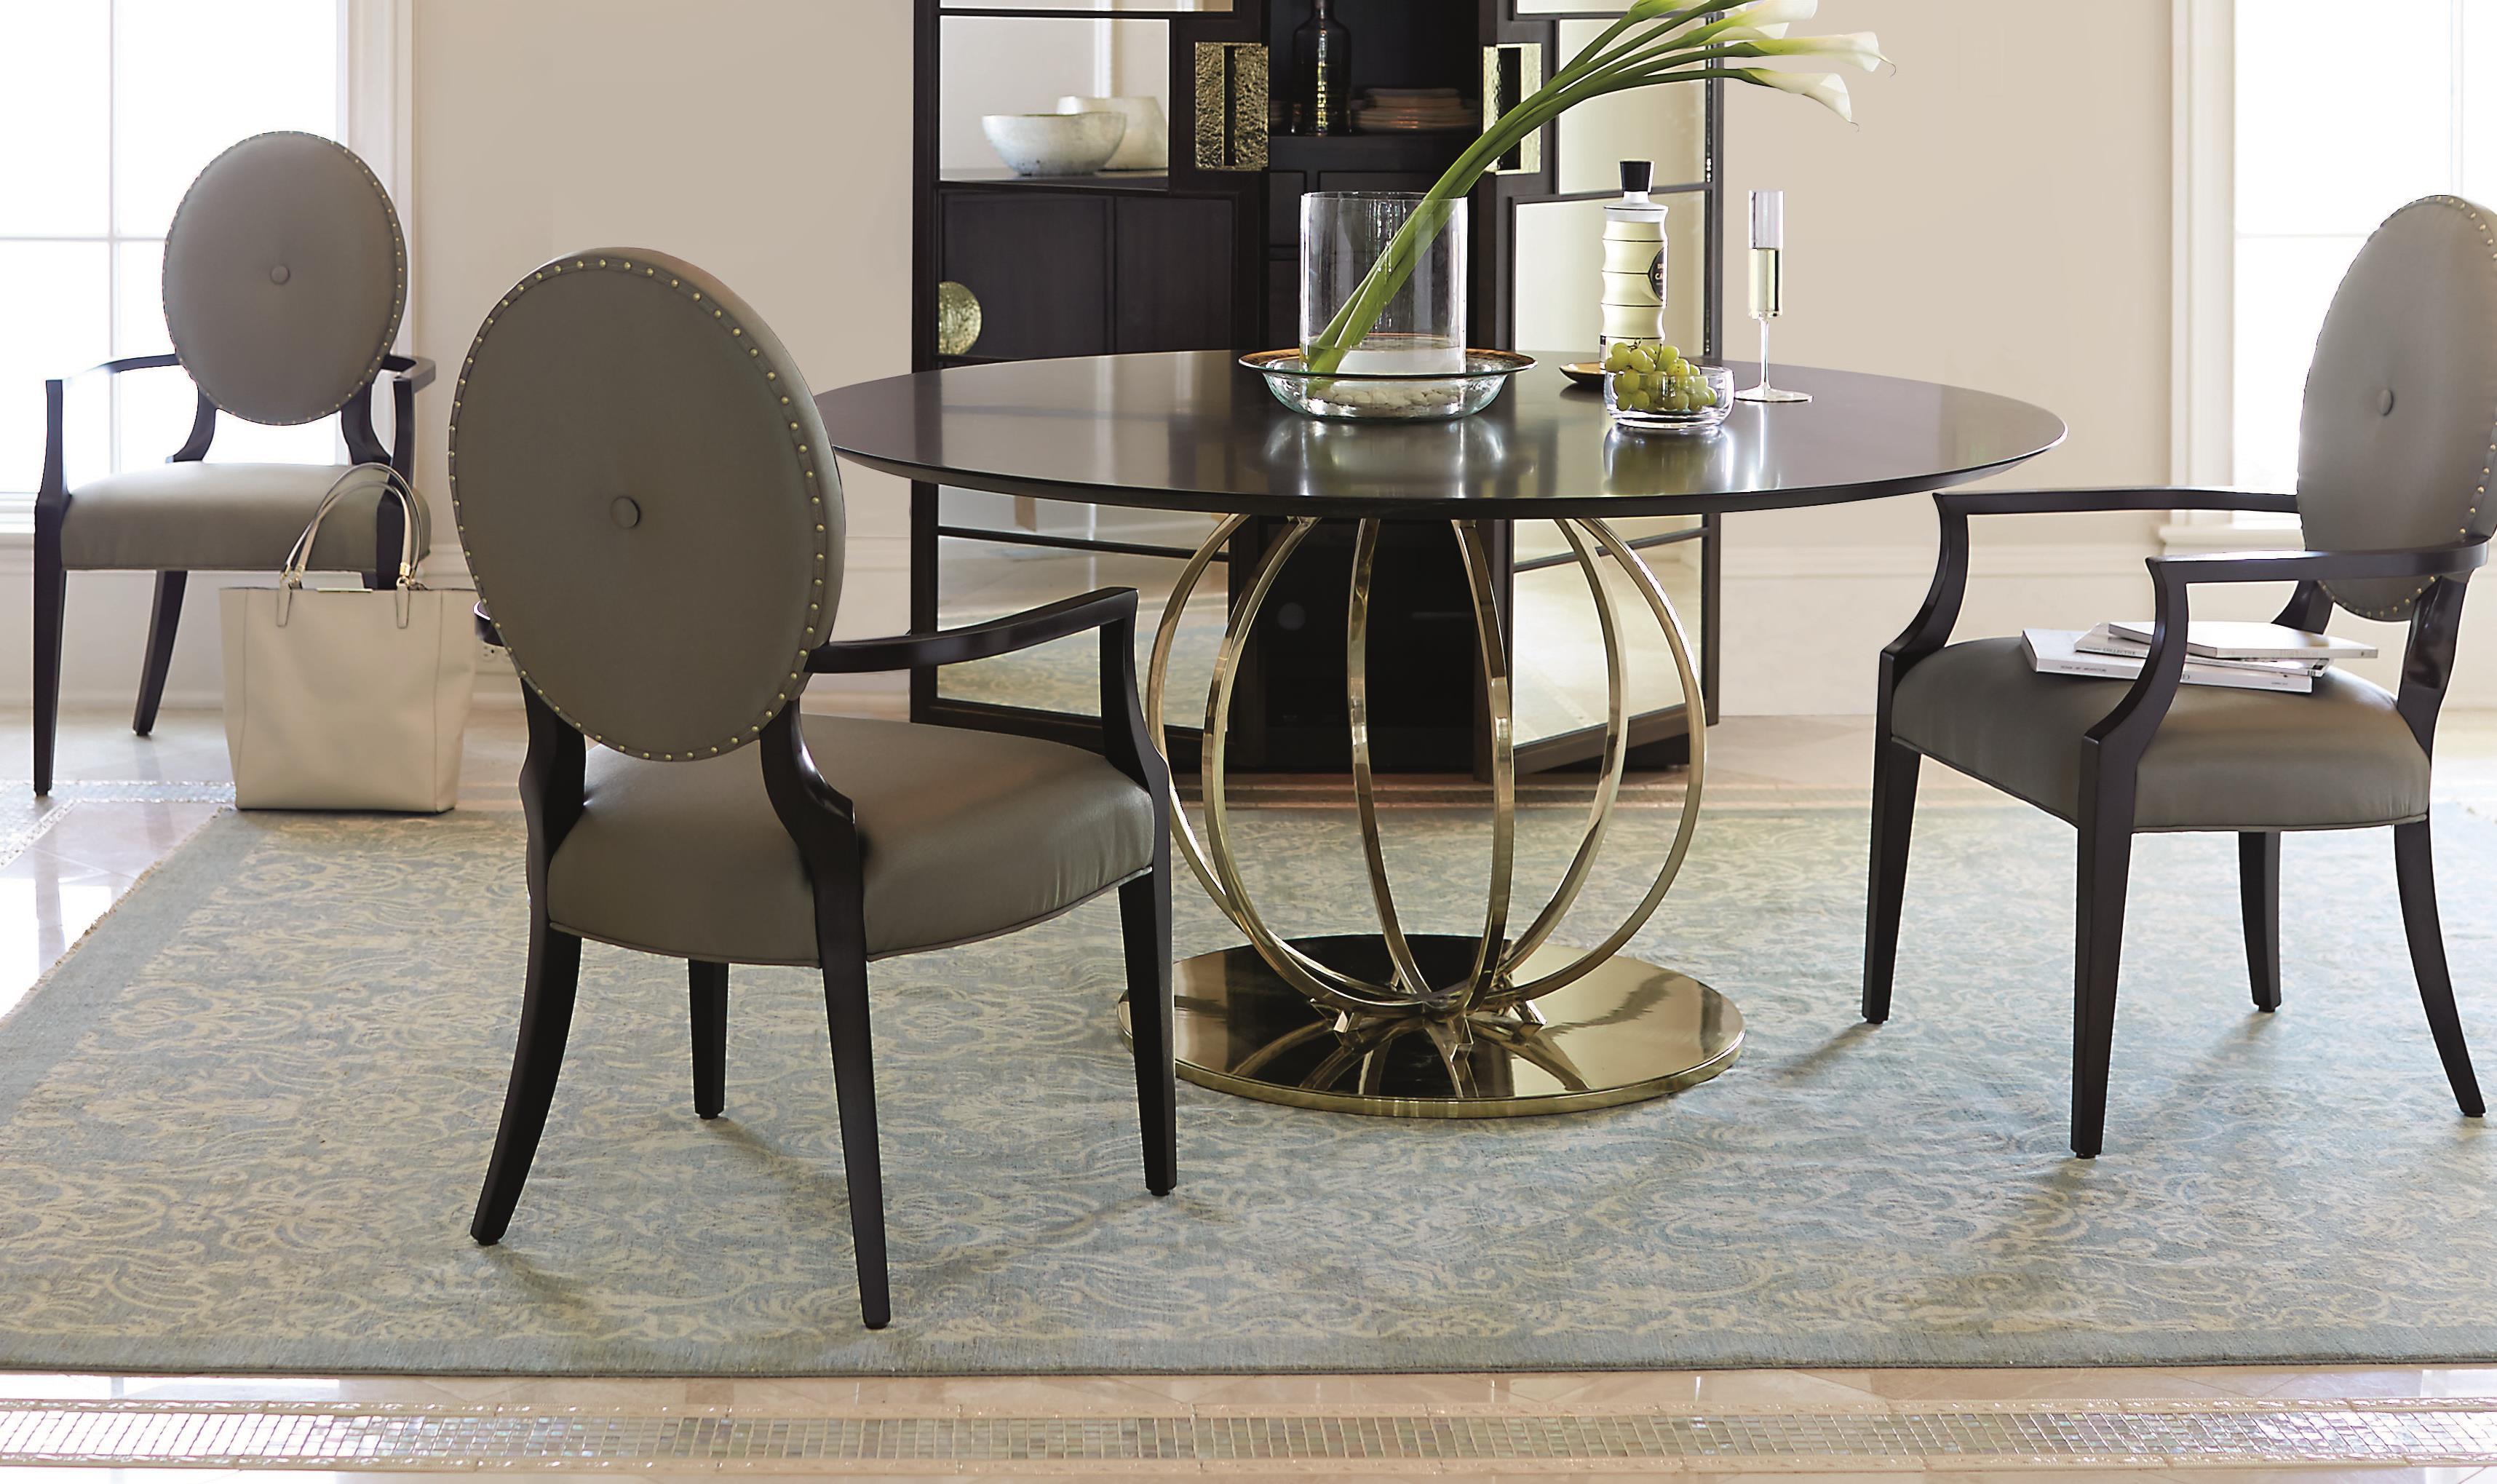 Bernhardt Soho Soho 5-Piece Dining Set - Item Number: 358134612